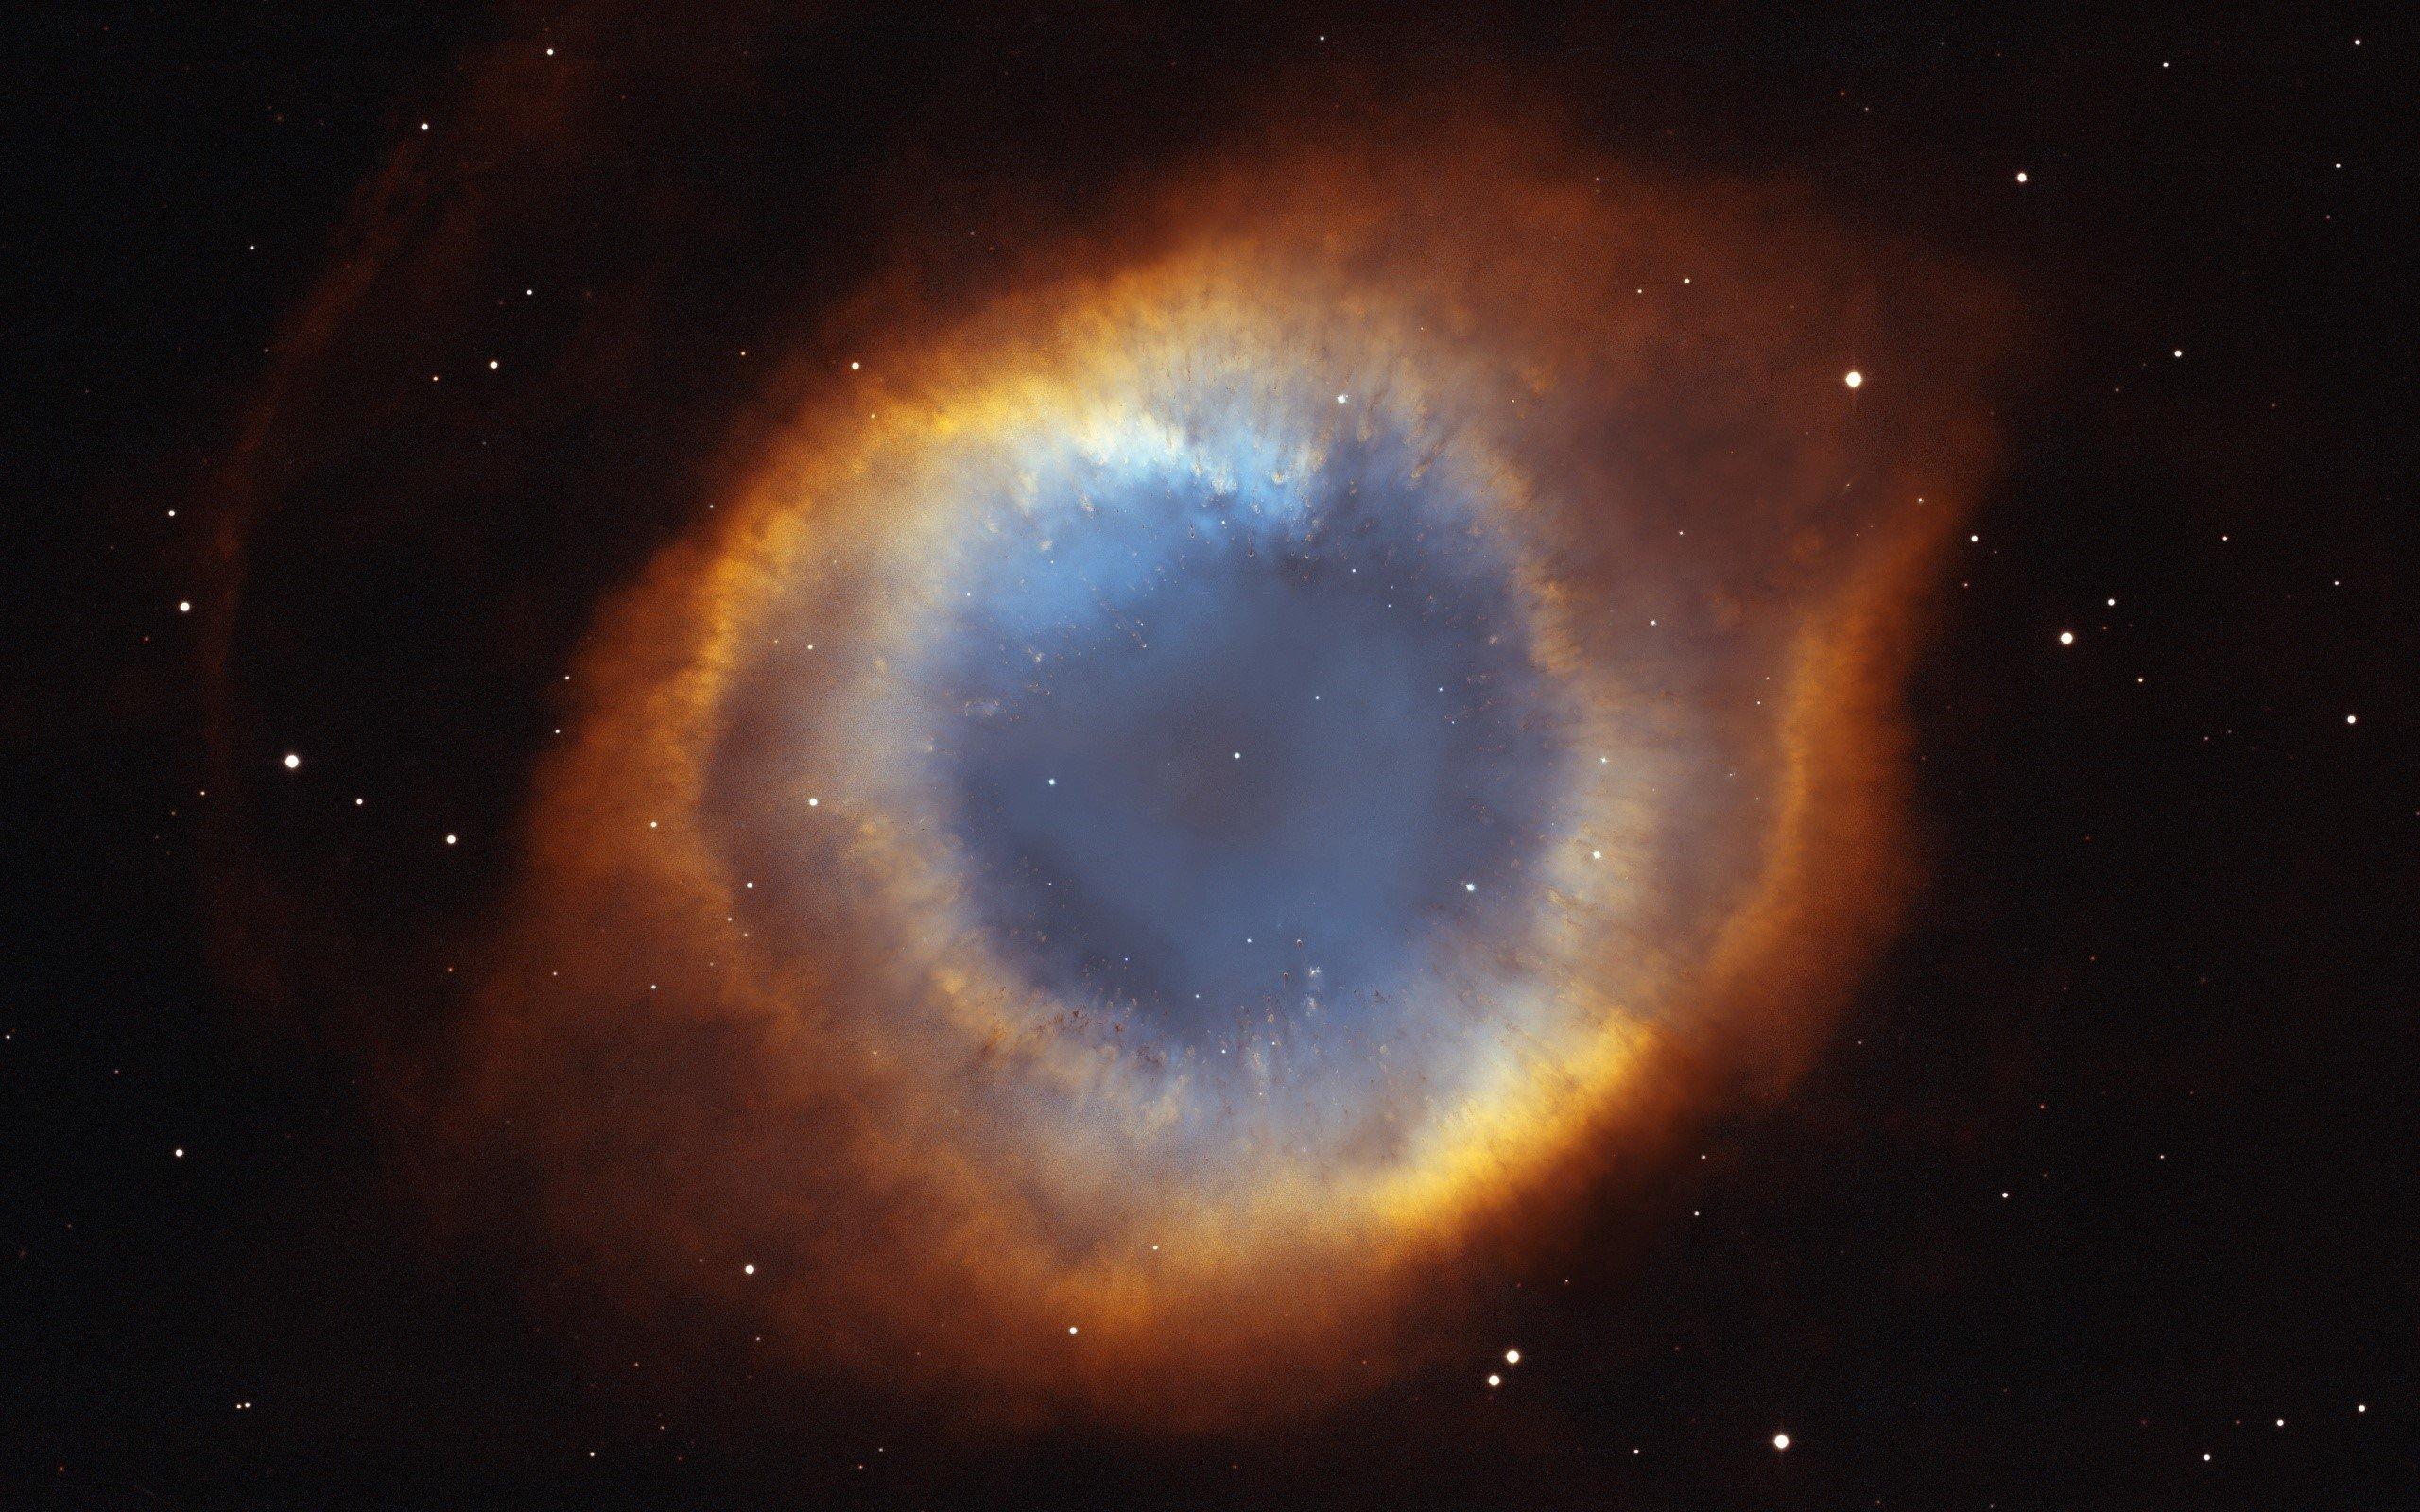 Wallpaper Nebula of space